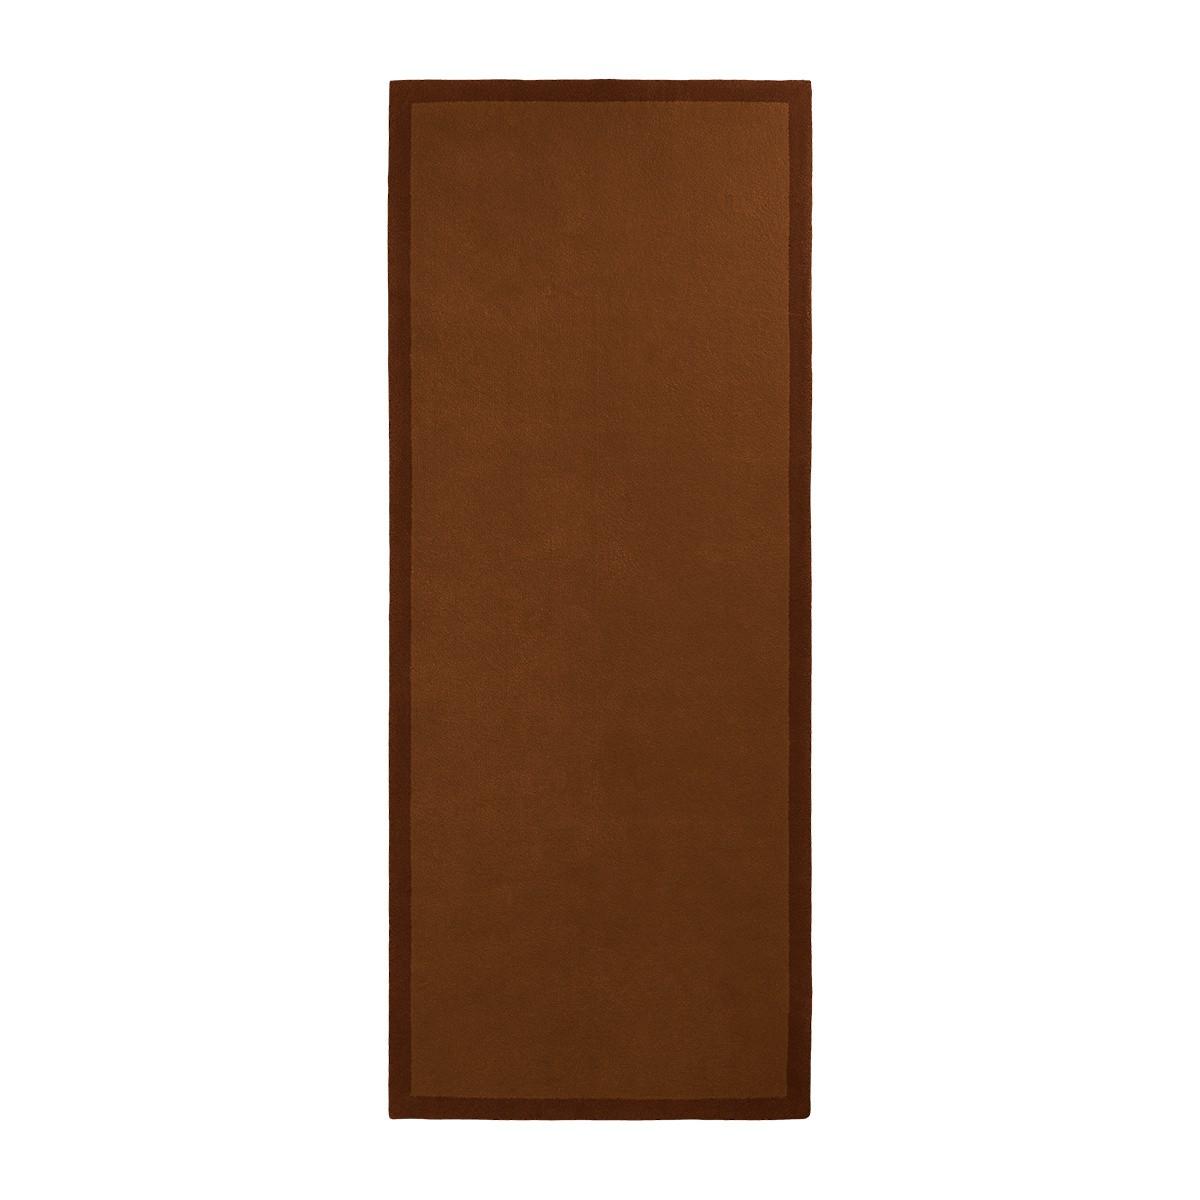 Tapis de couloir Luna chocolat